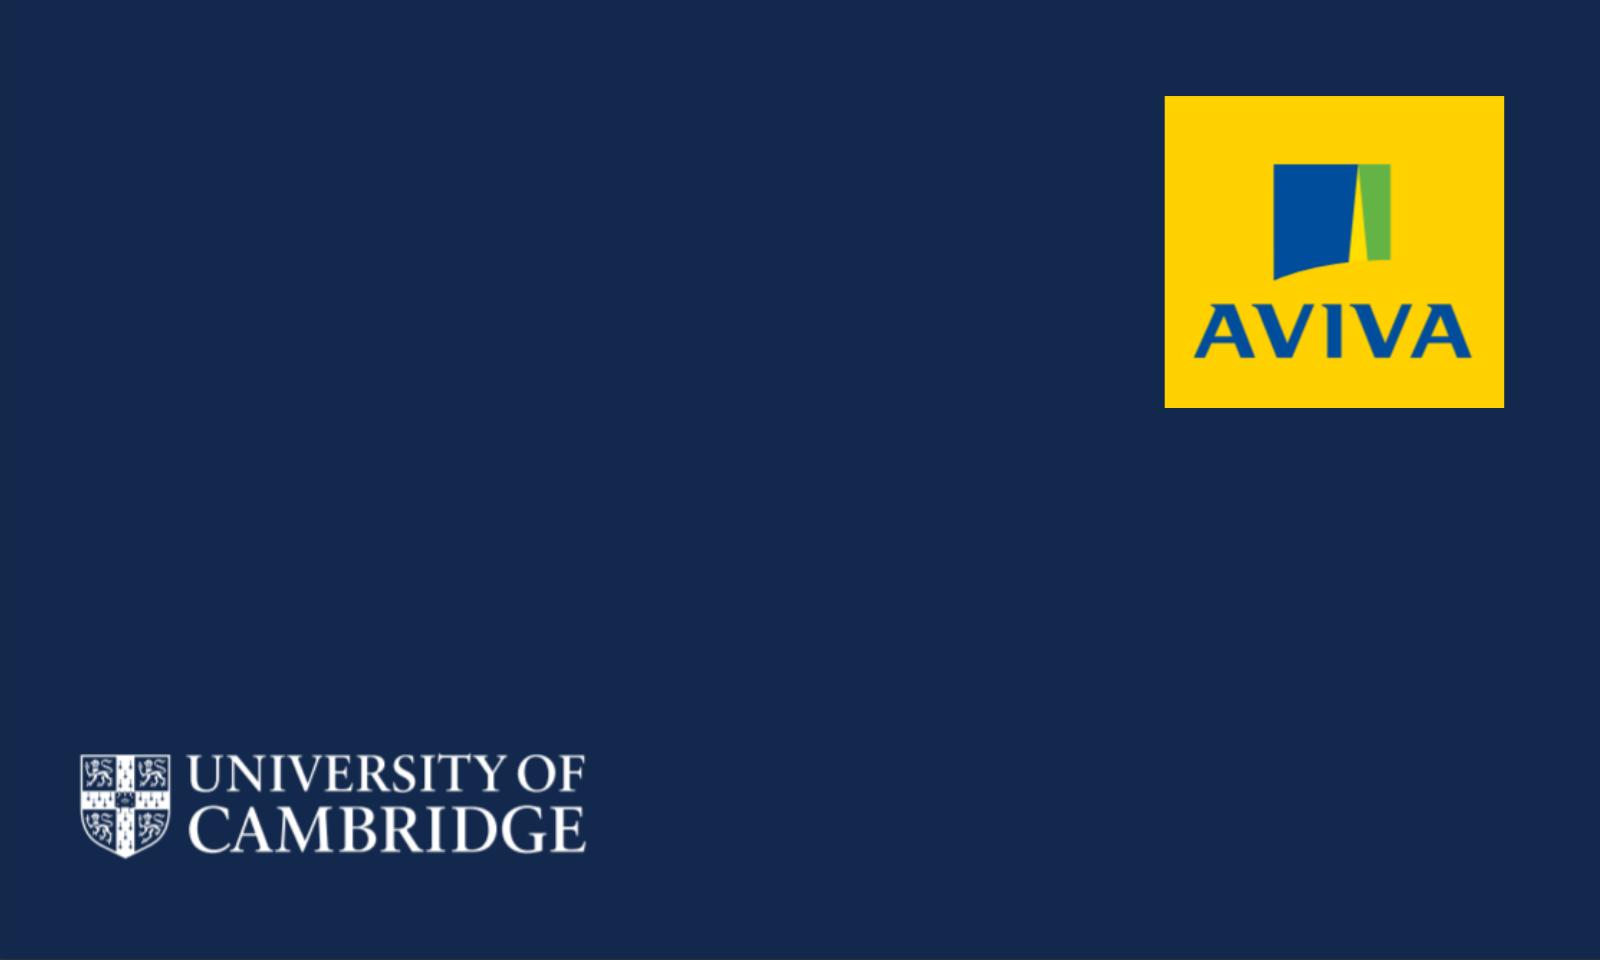 Aviva's data science partnership with the University of Cambridge